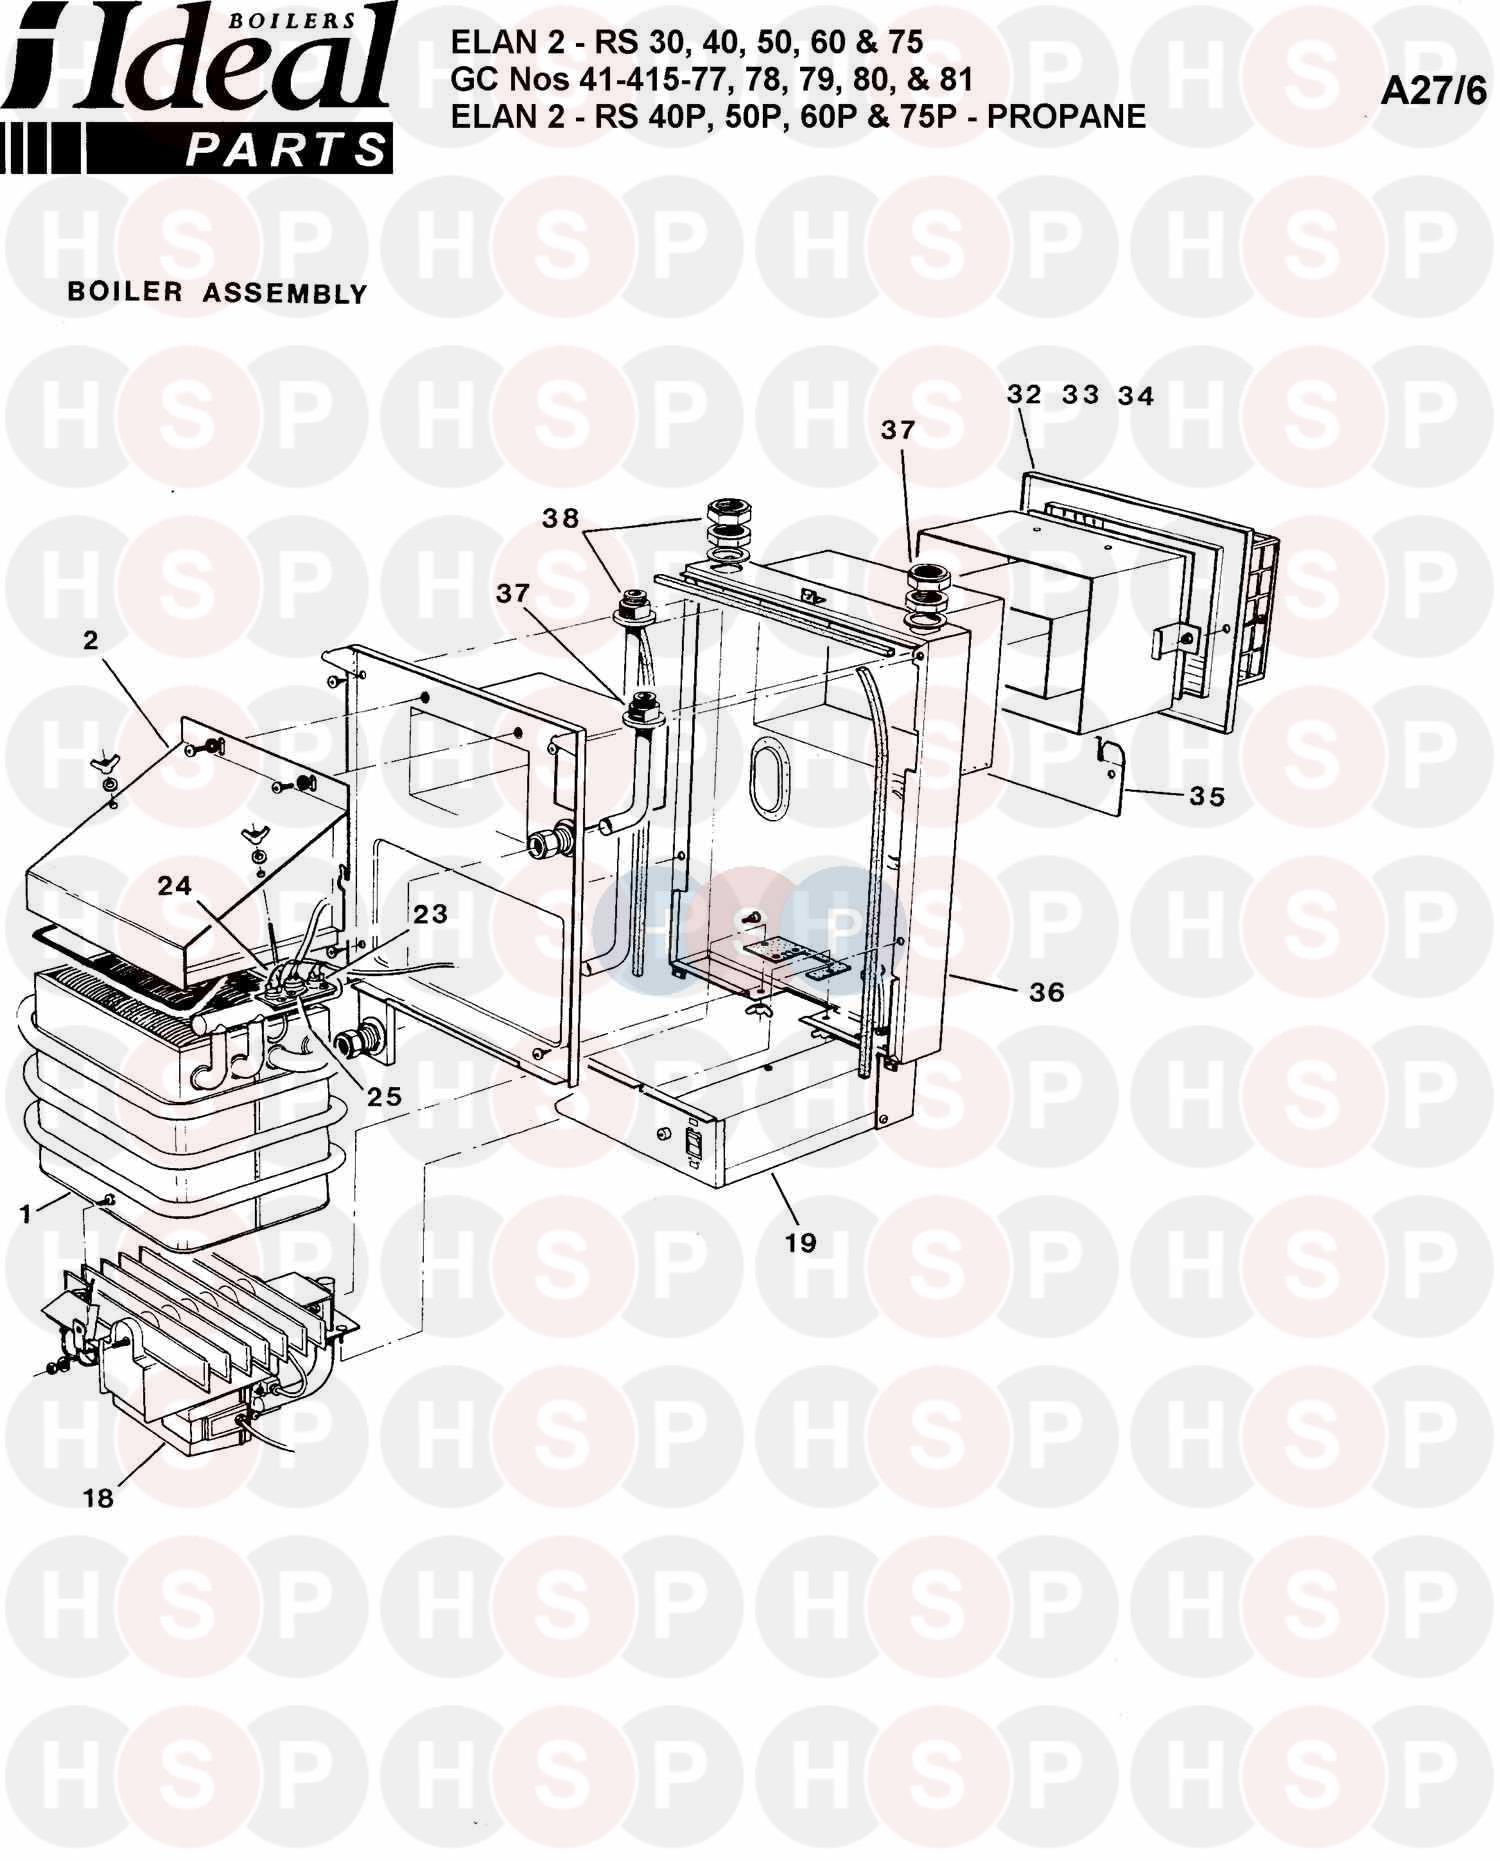 Ideal ELAN 2 RS 40 (BOILER ASSEMBLY 1) Diagram